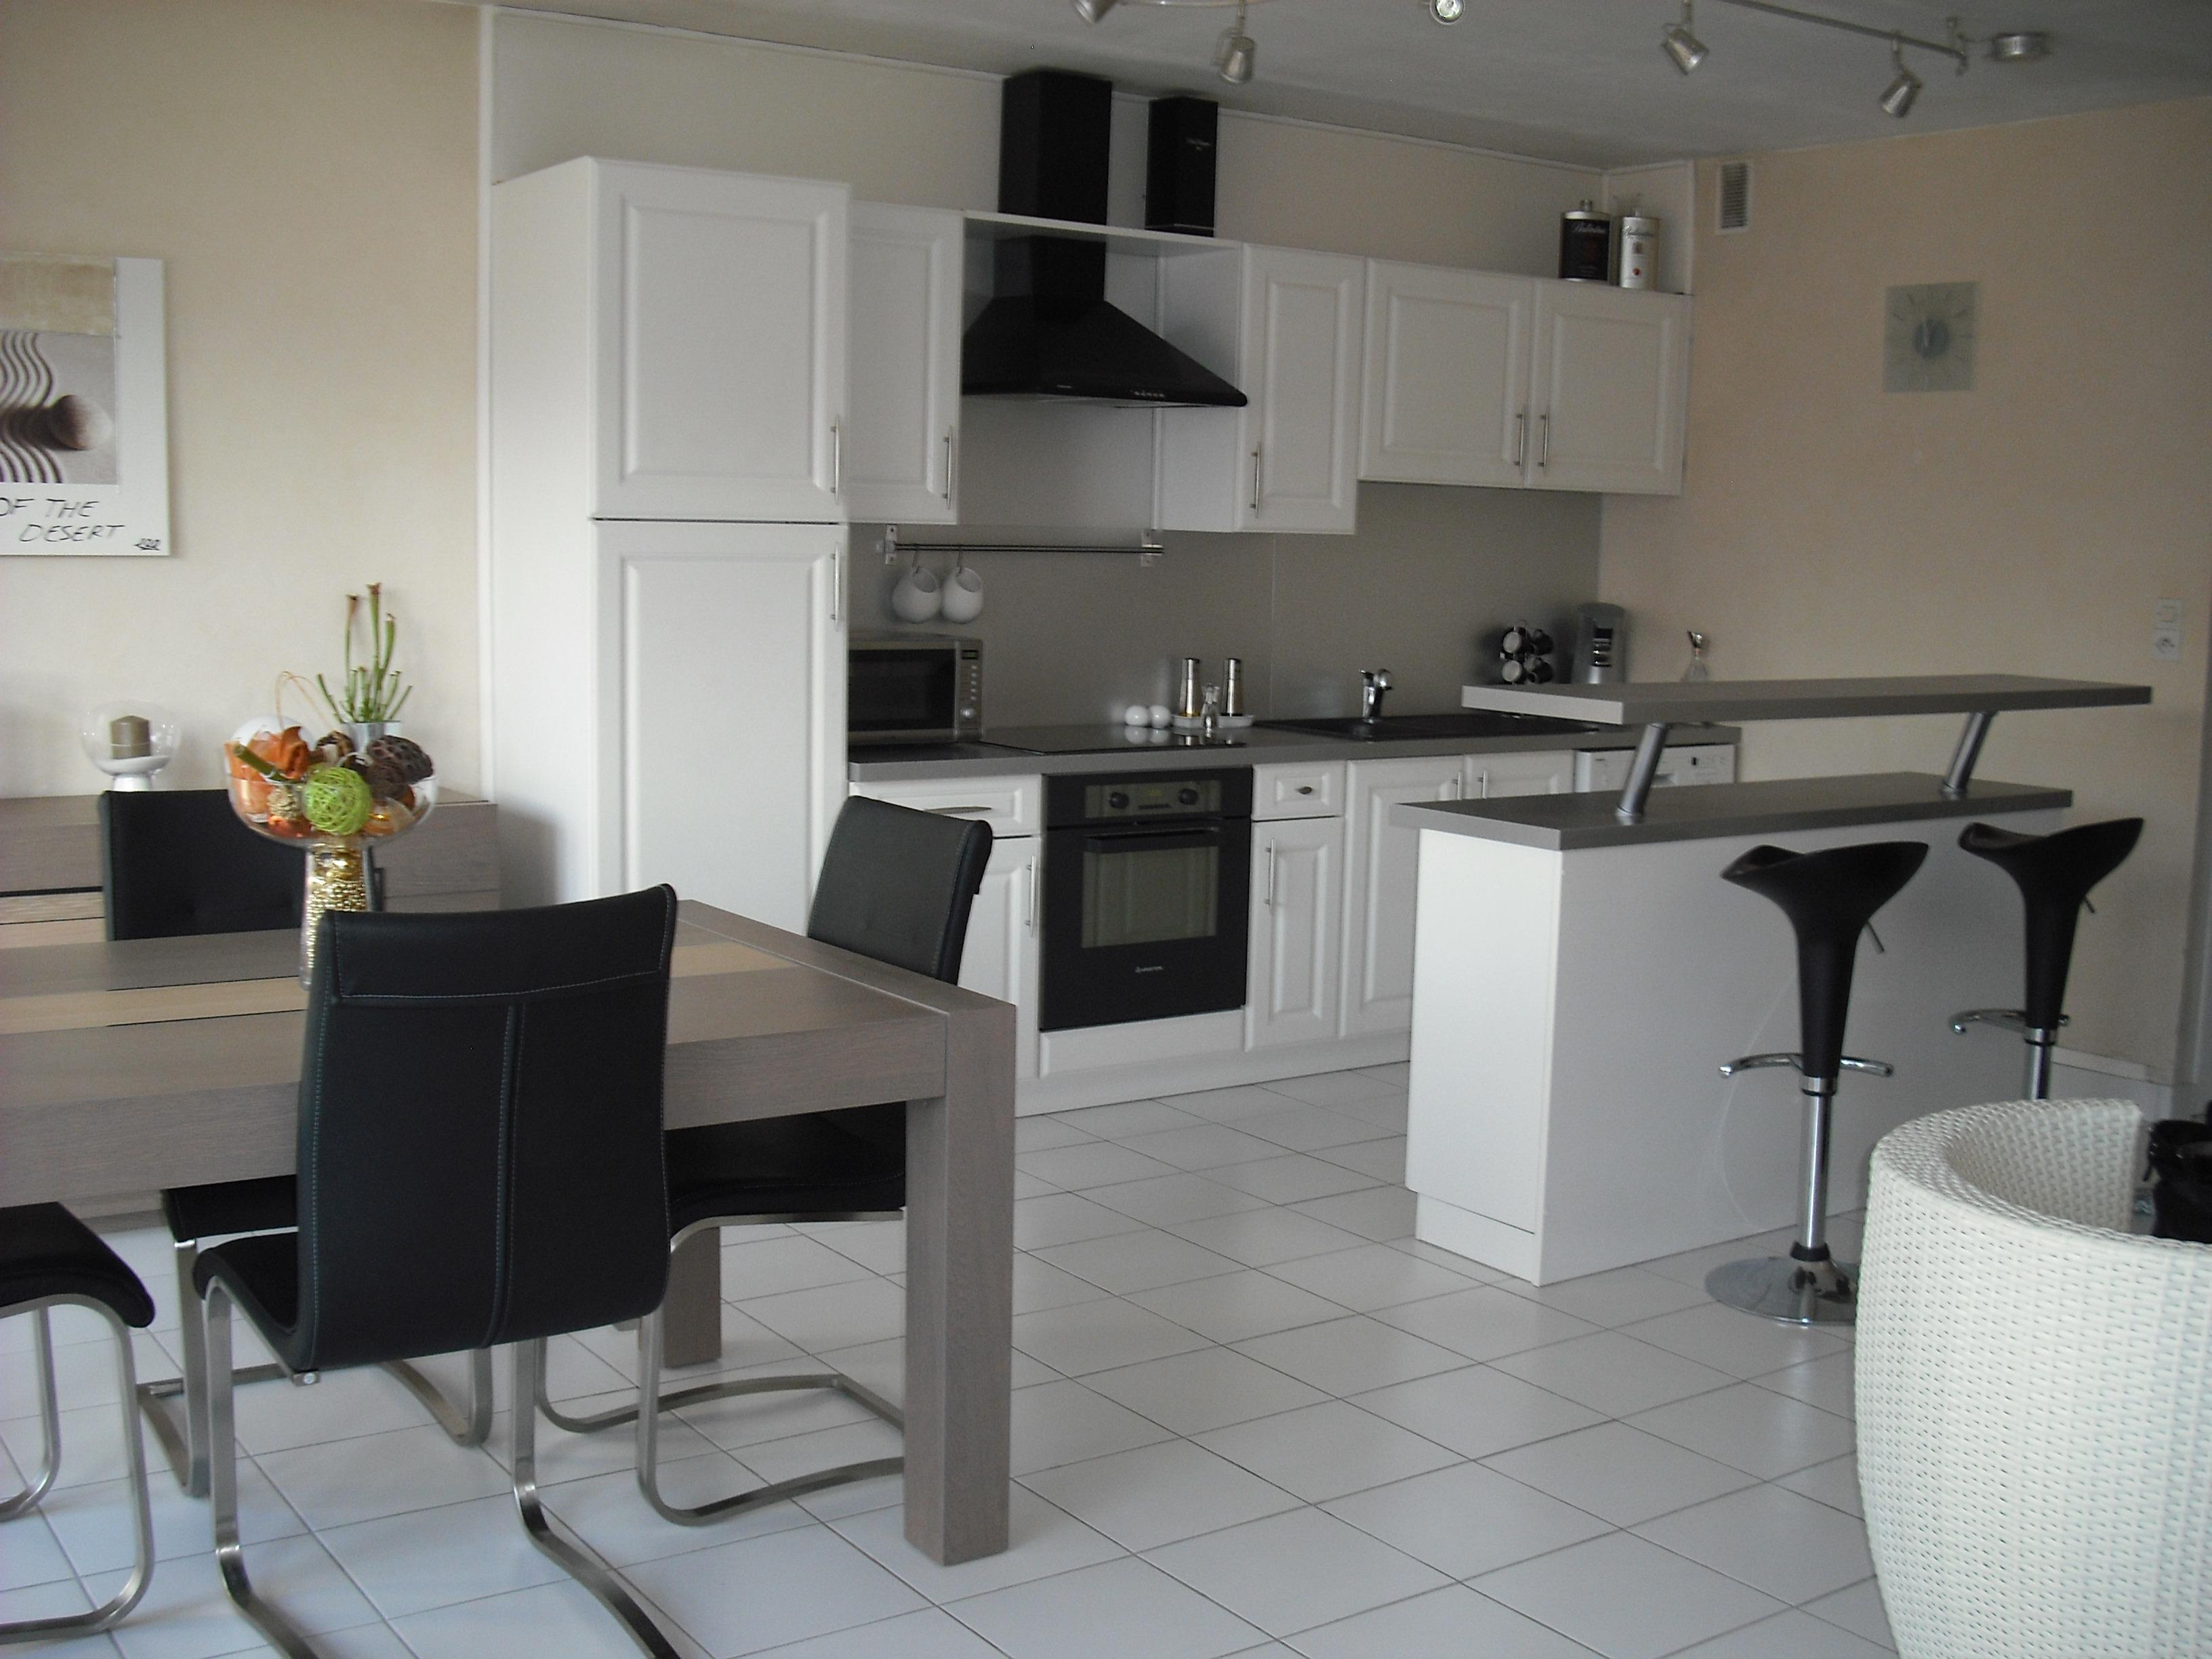 Fotos gratis : mesa, piso, casa, cabaña, desván, cocina, propiedad ...